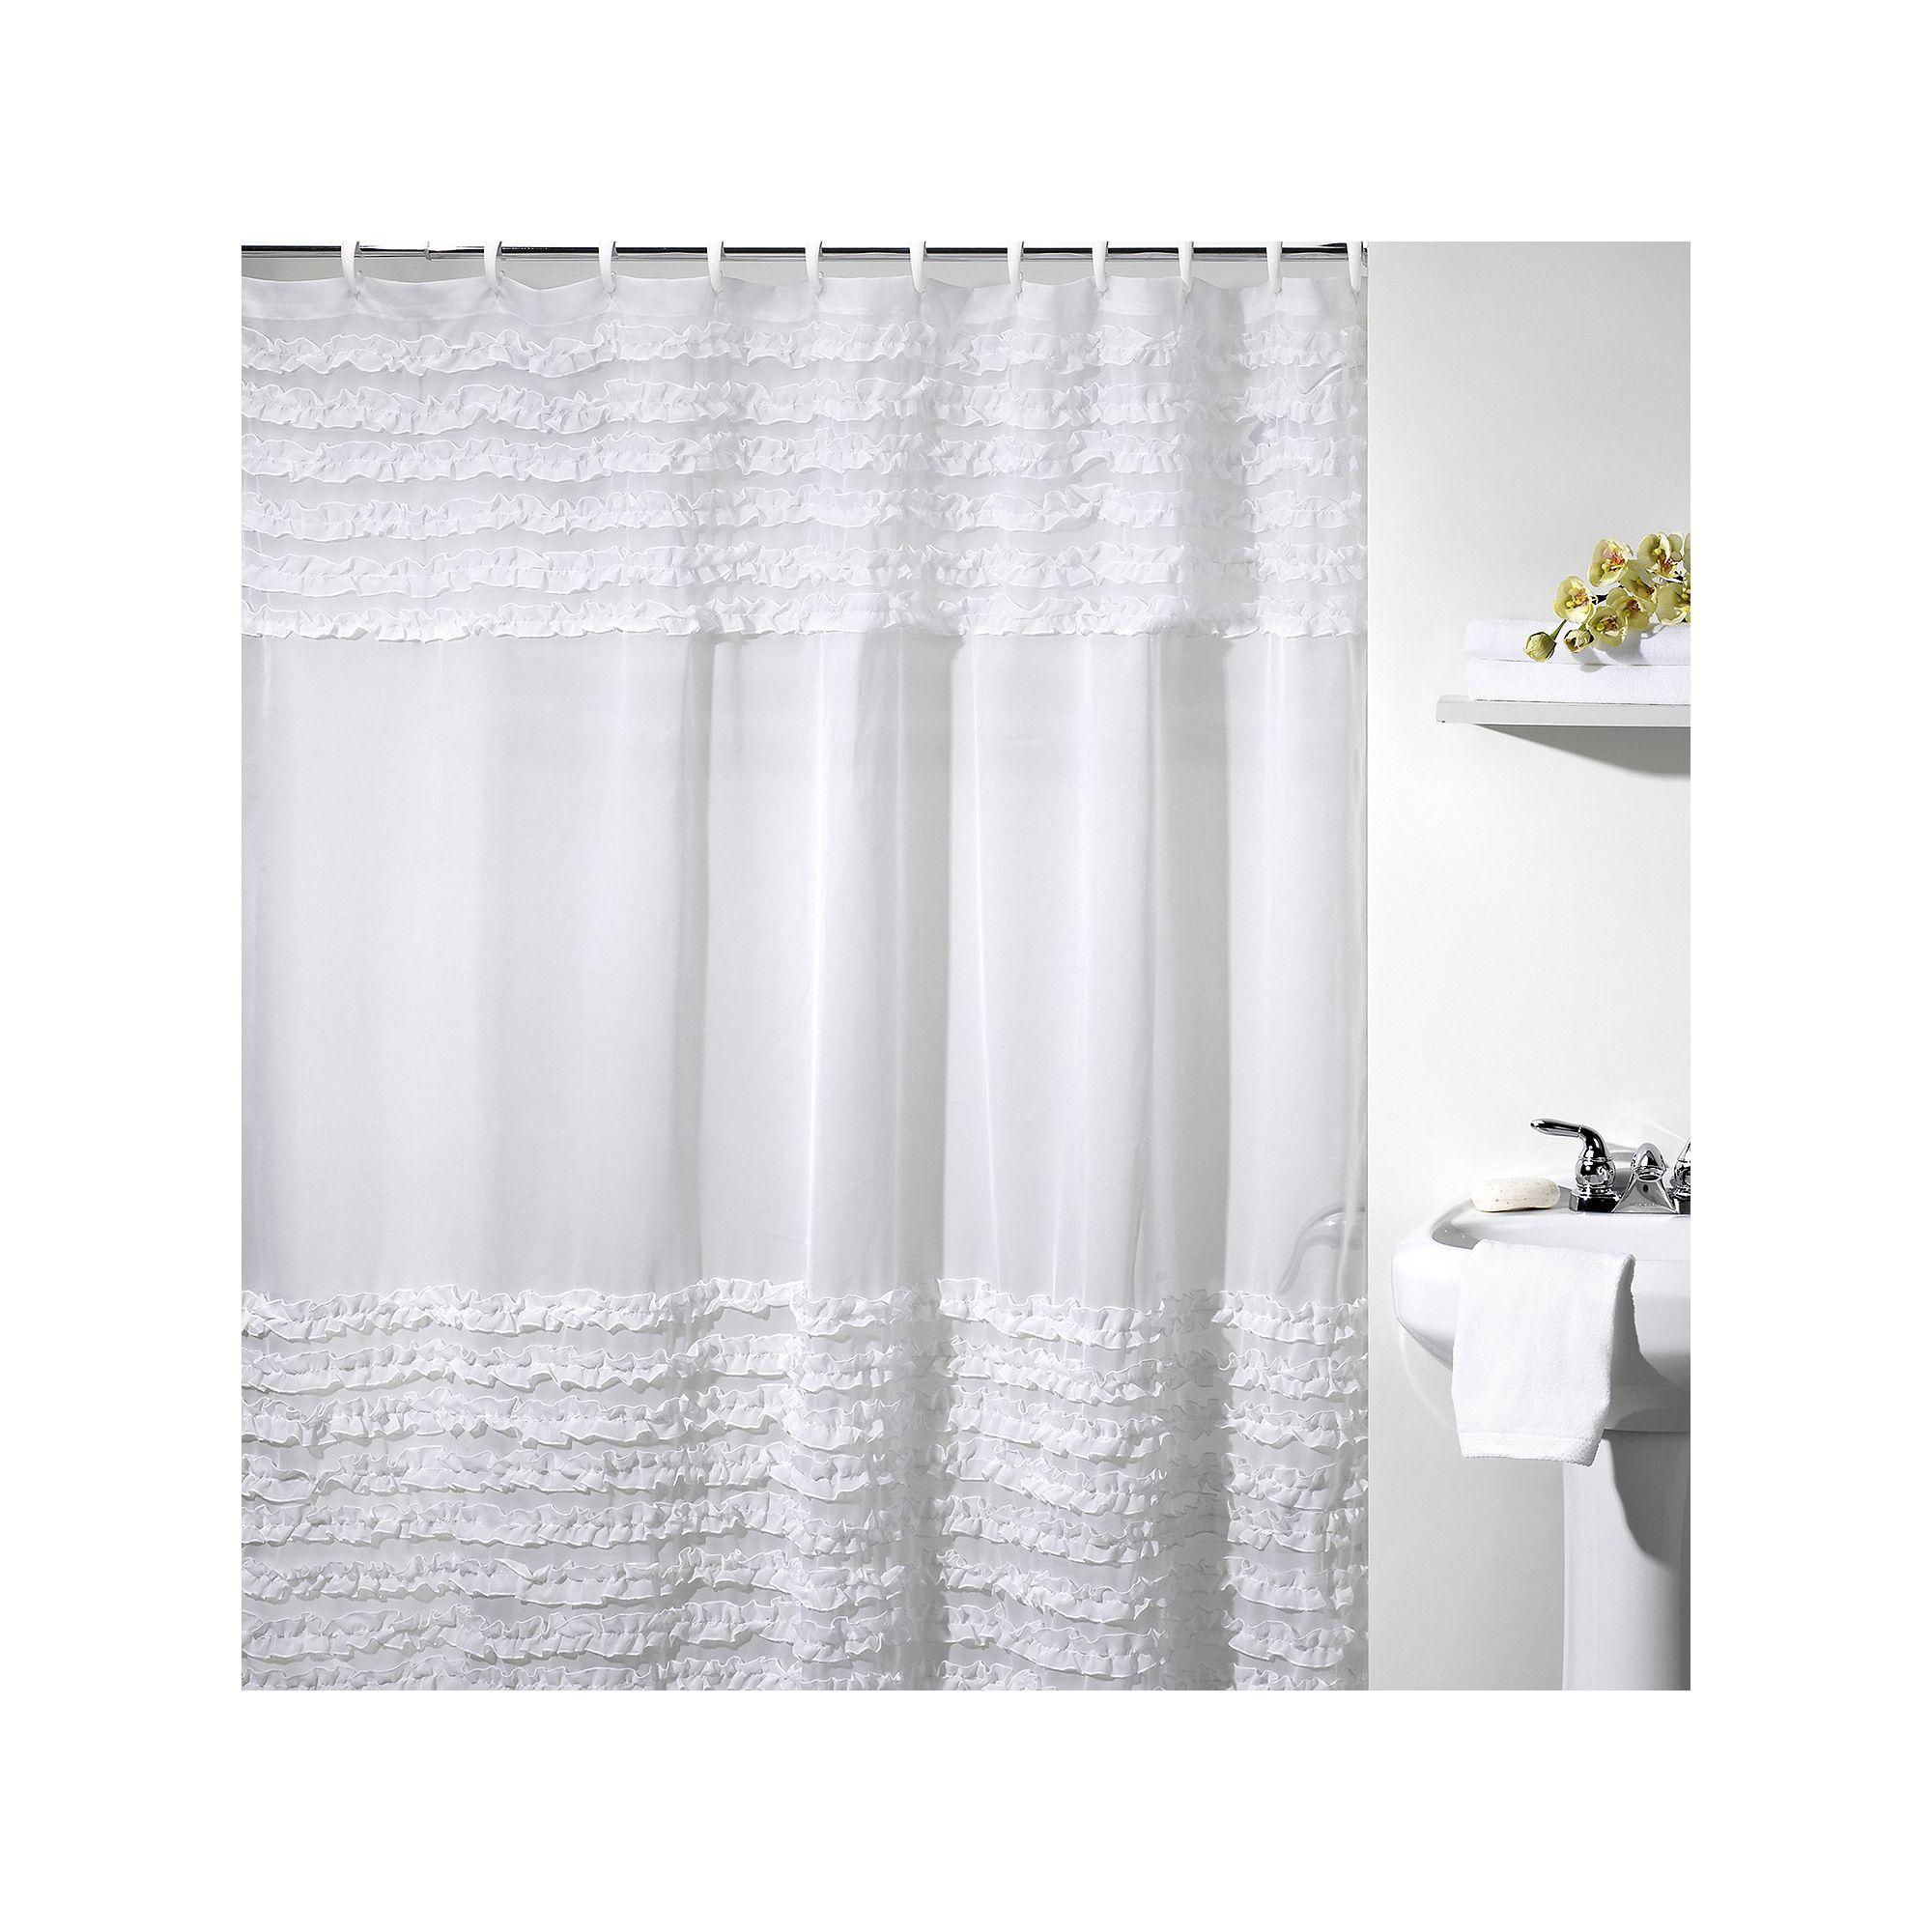 Creative Bath Shower Curtain creative bath ruffles fabric shower curtain, white | ruffles